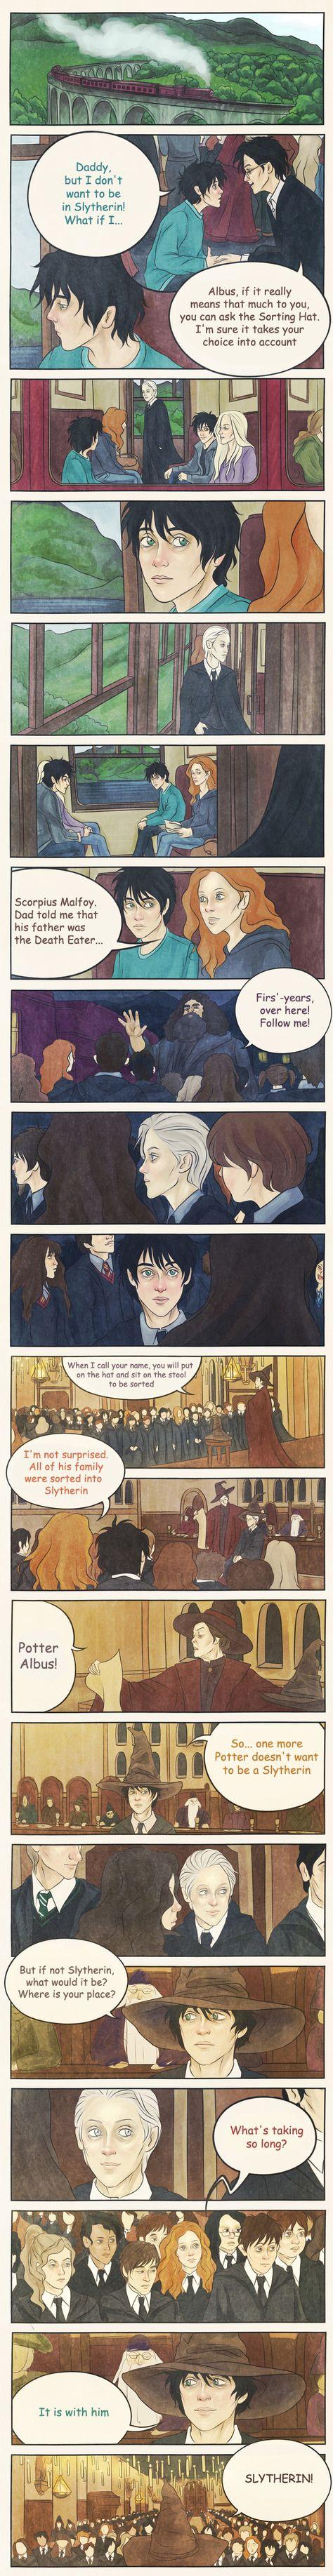 Not Slytherin? by AnastasiaMantihora.deviantart.com on @deviantART. The sorting of Albus Severus Potter